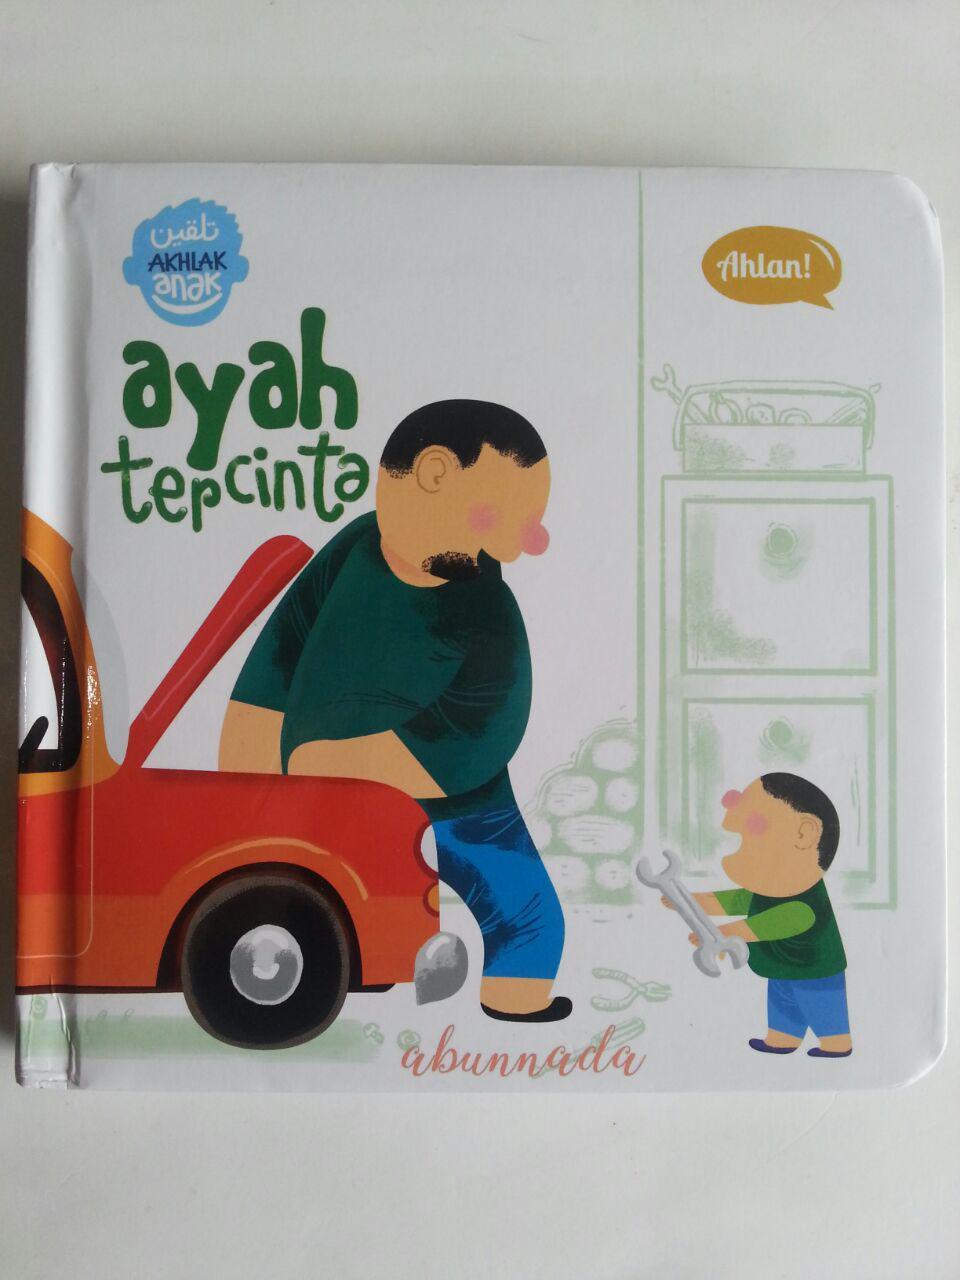 Buku Anak Talqin Akhlak Anak Ayah Tercinta cover 2